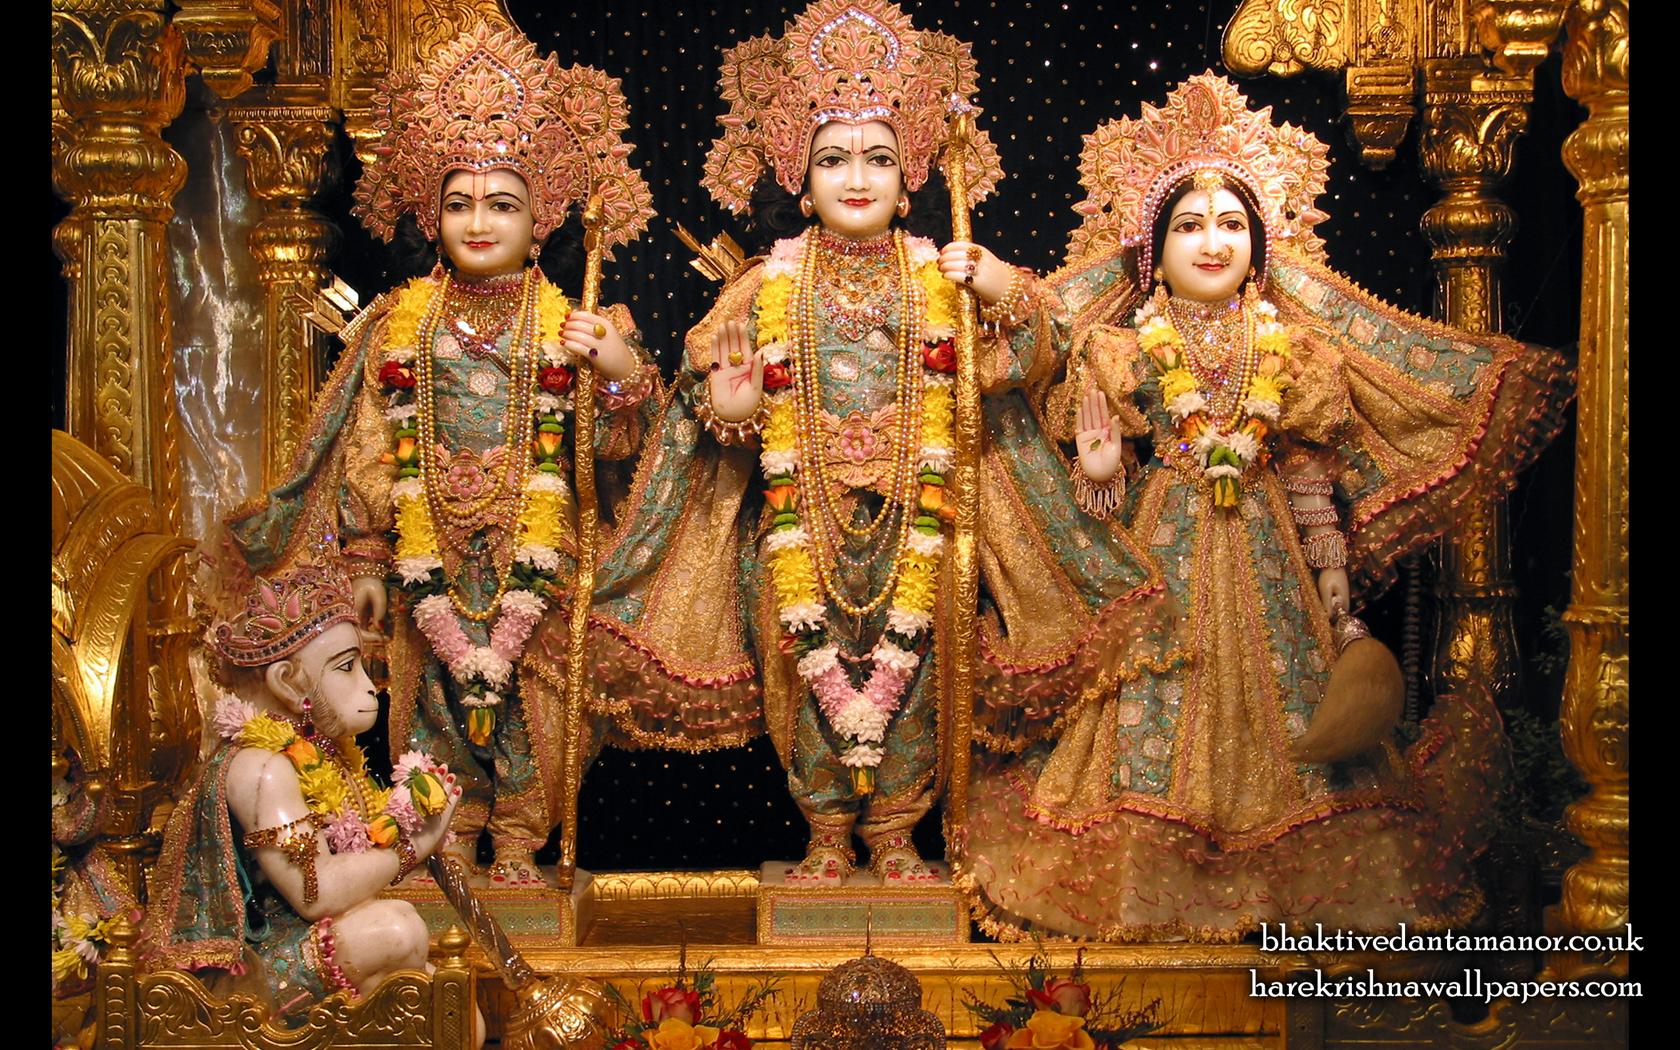 Sri Sri Sita Rama Laxman Hanuman Wallpaper (003) Size 1680x1050 Download